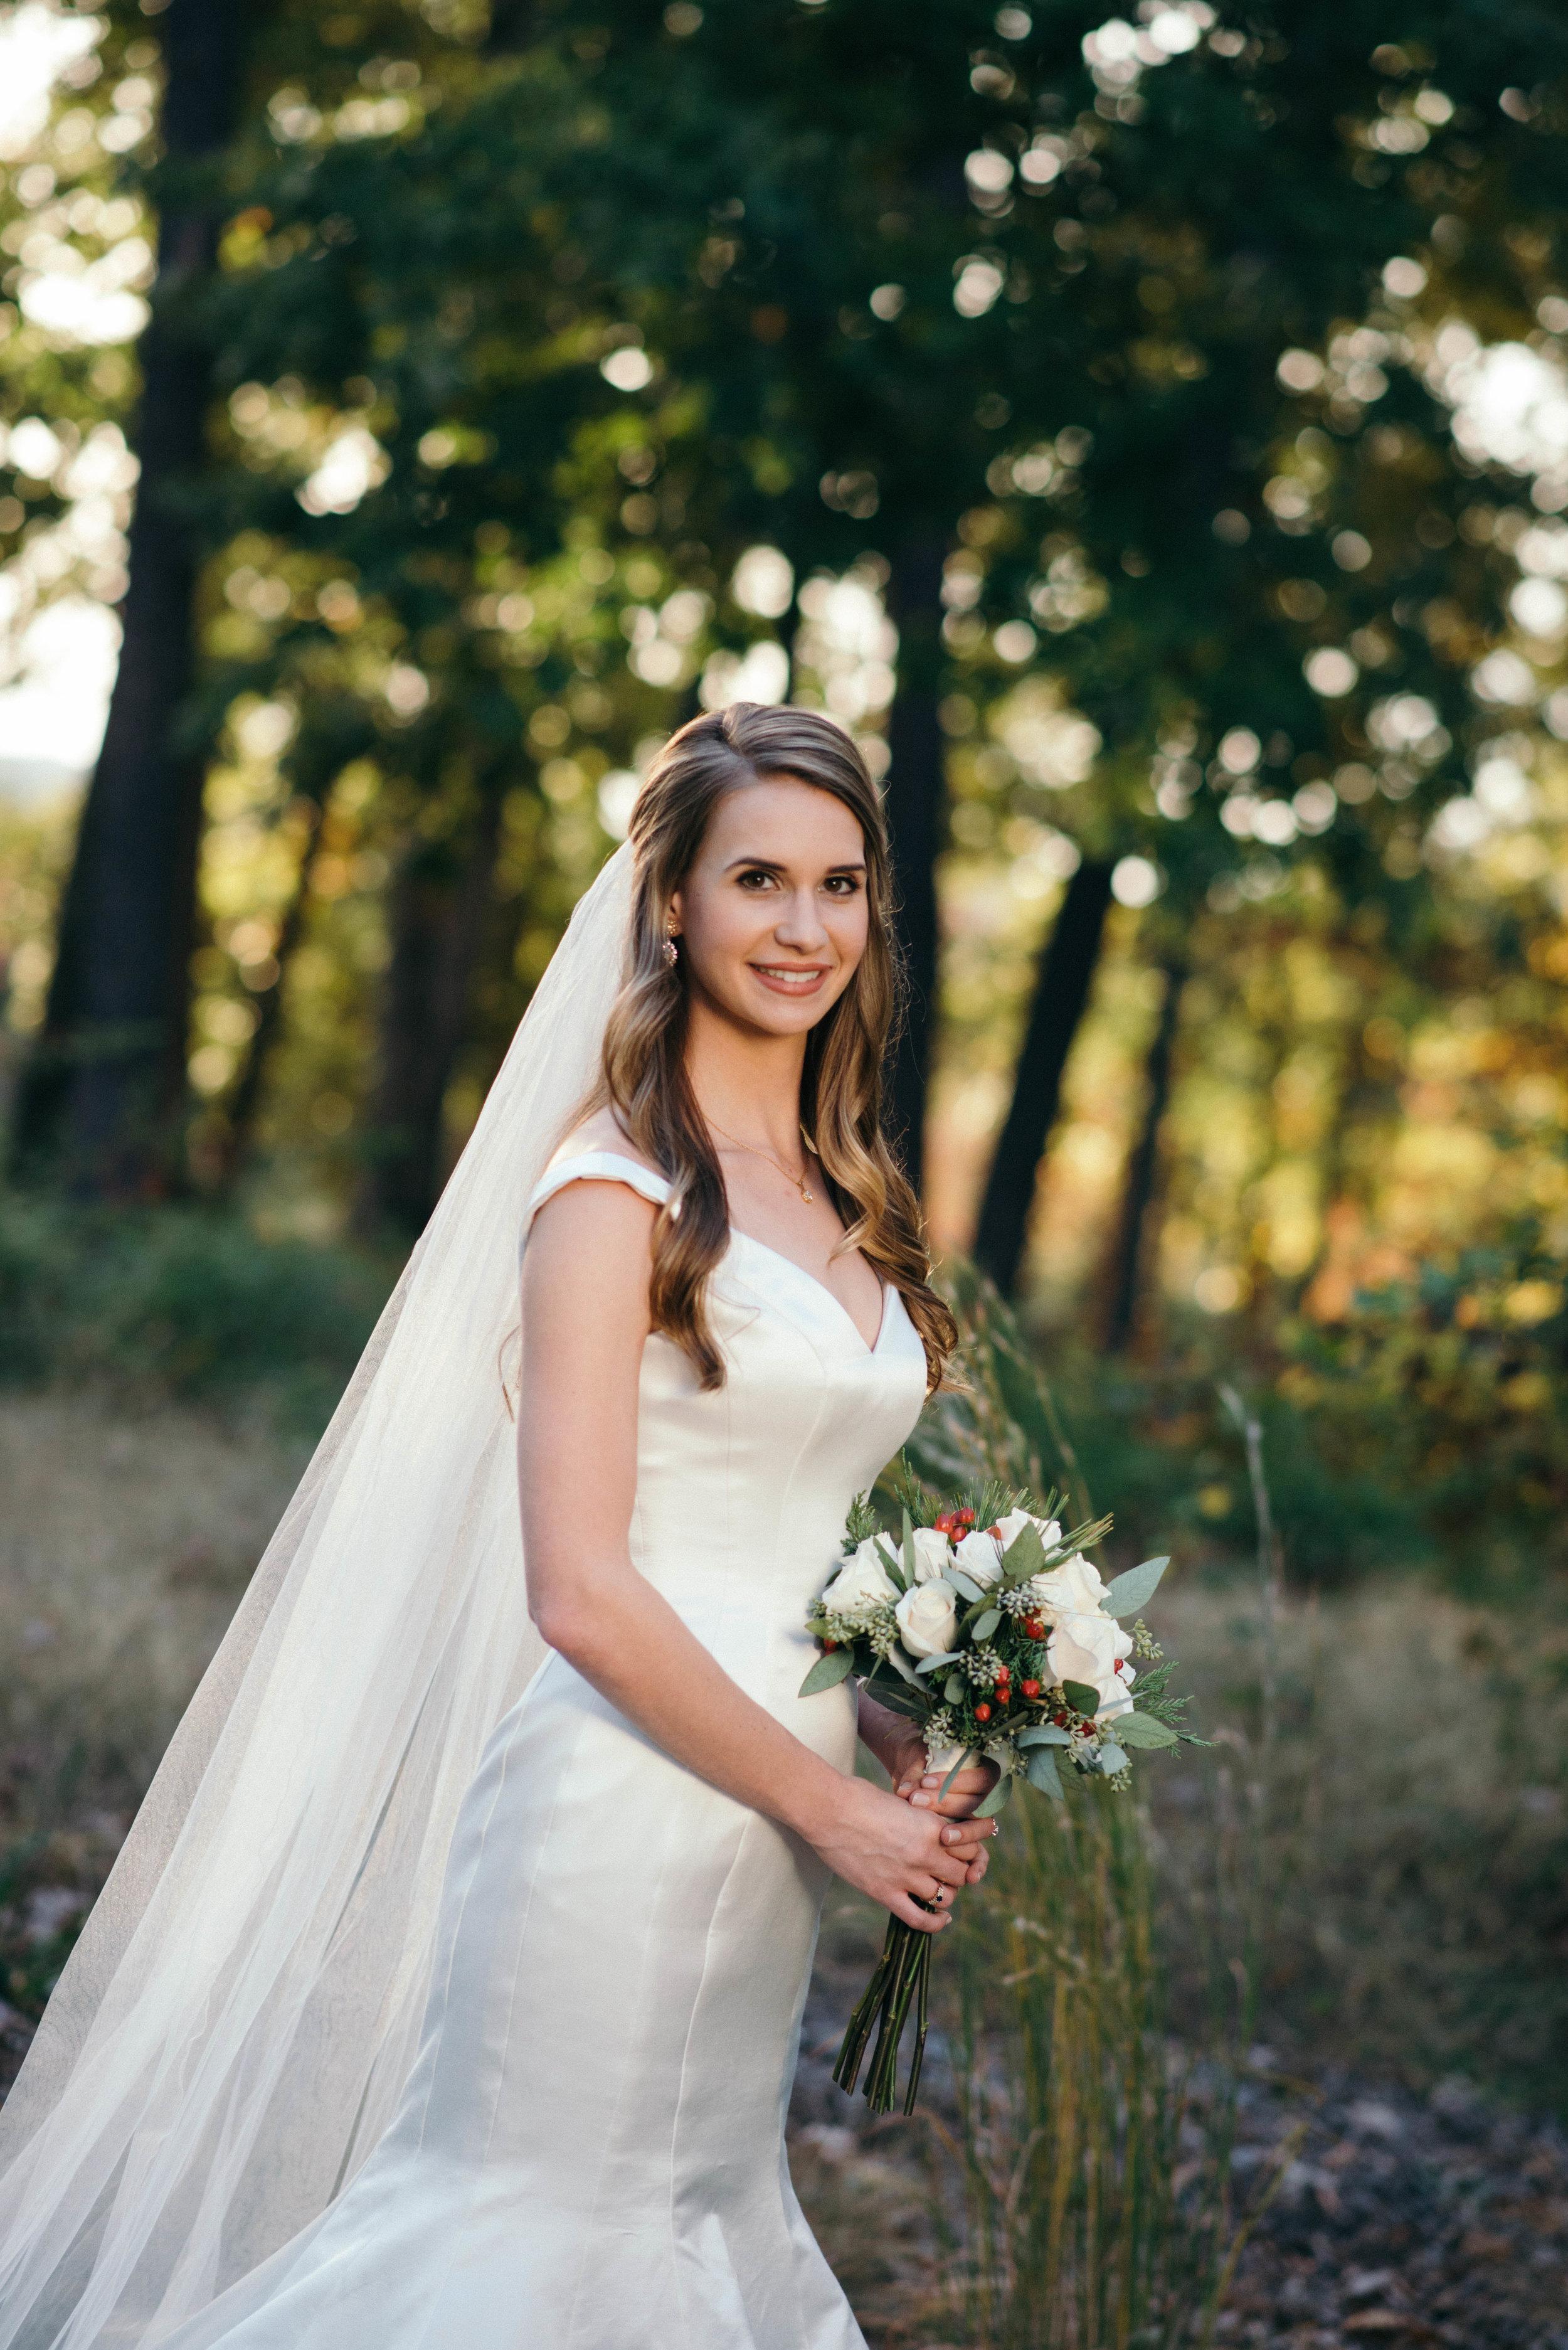 JuliaWilliams|Bridals|Color_MiraPhotographs-55.jpg